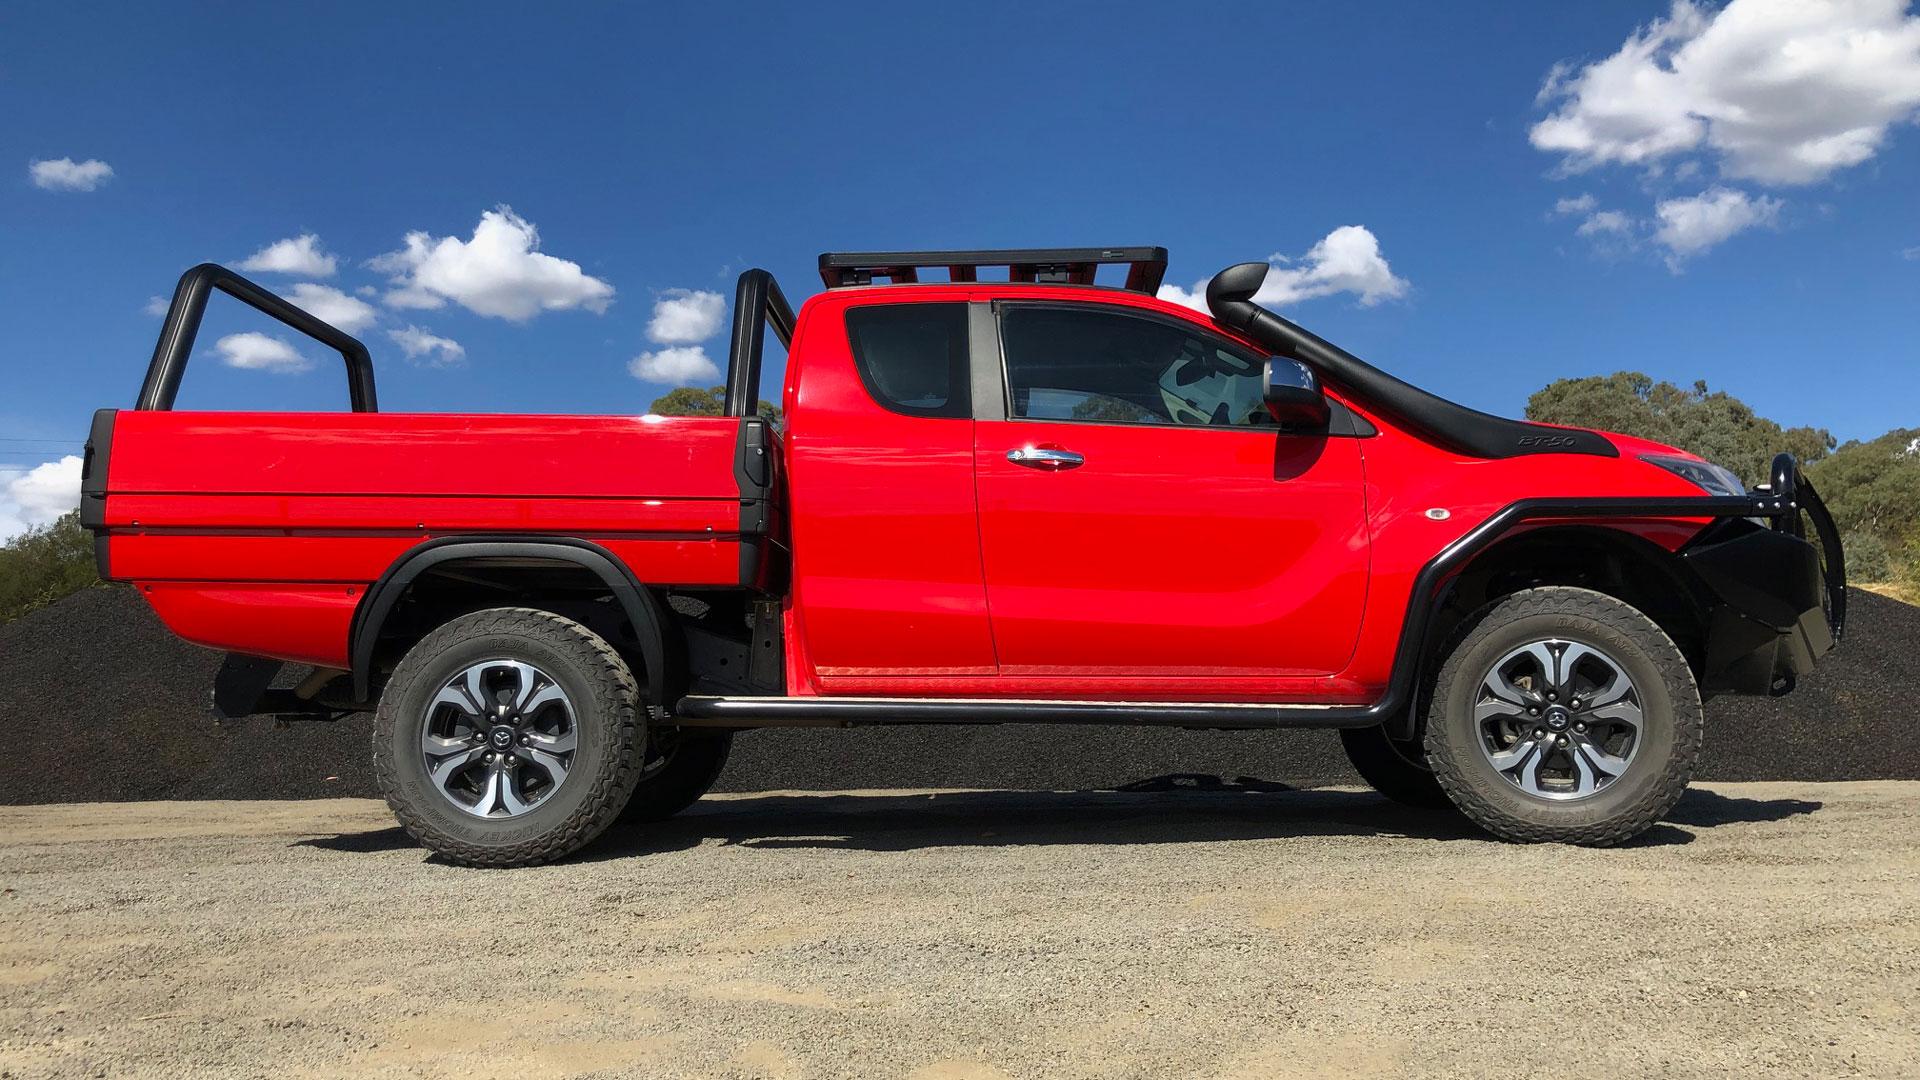 SUB ute tray installed on red Mazda